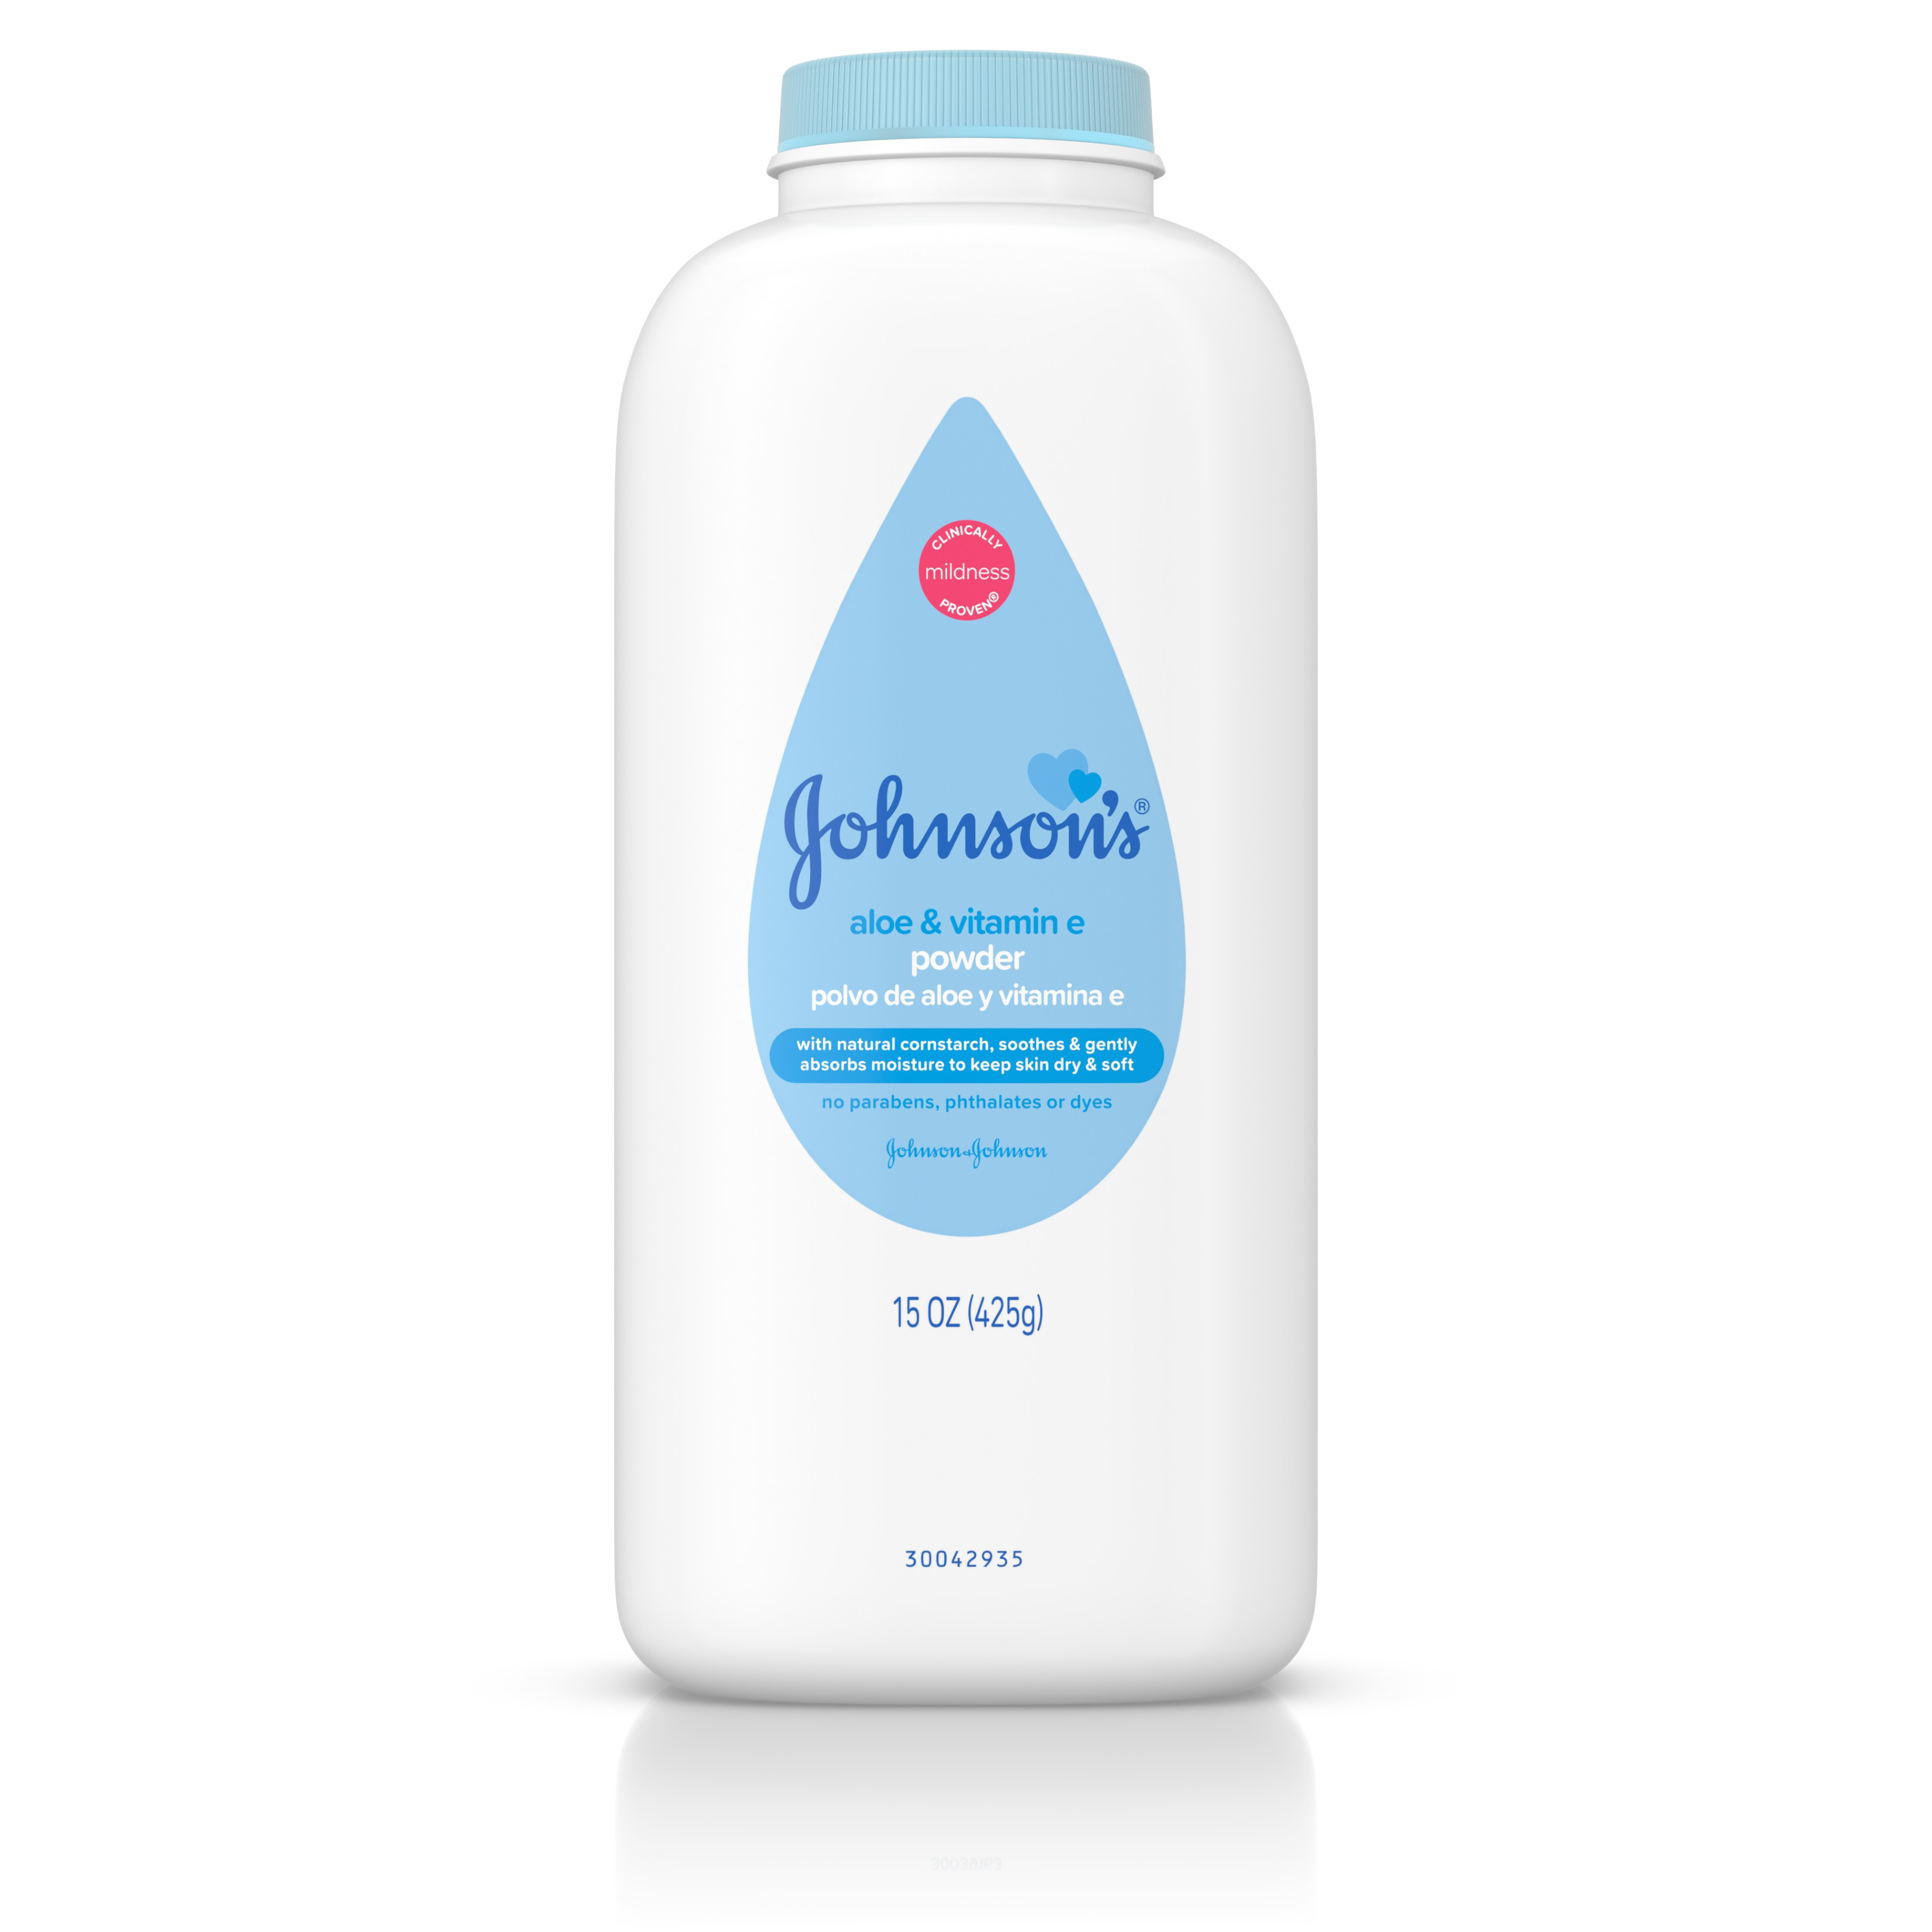 Johnson's Naturally Derived Cornstarch Baby Powder with Aloe & Vitamin E, 15 oz